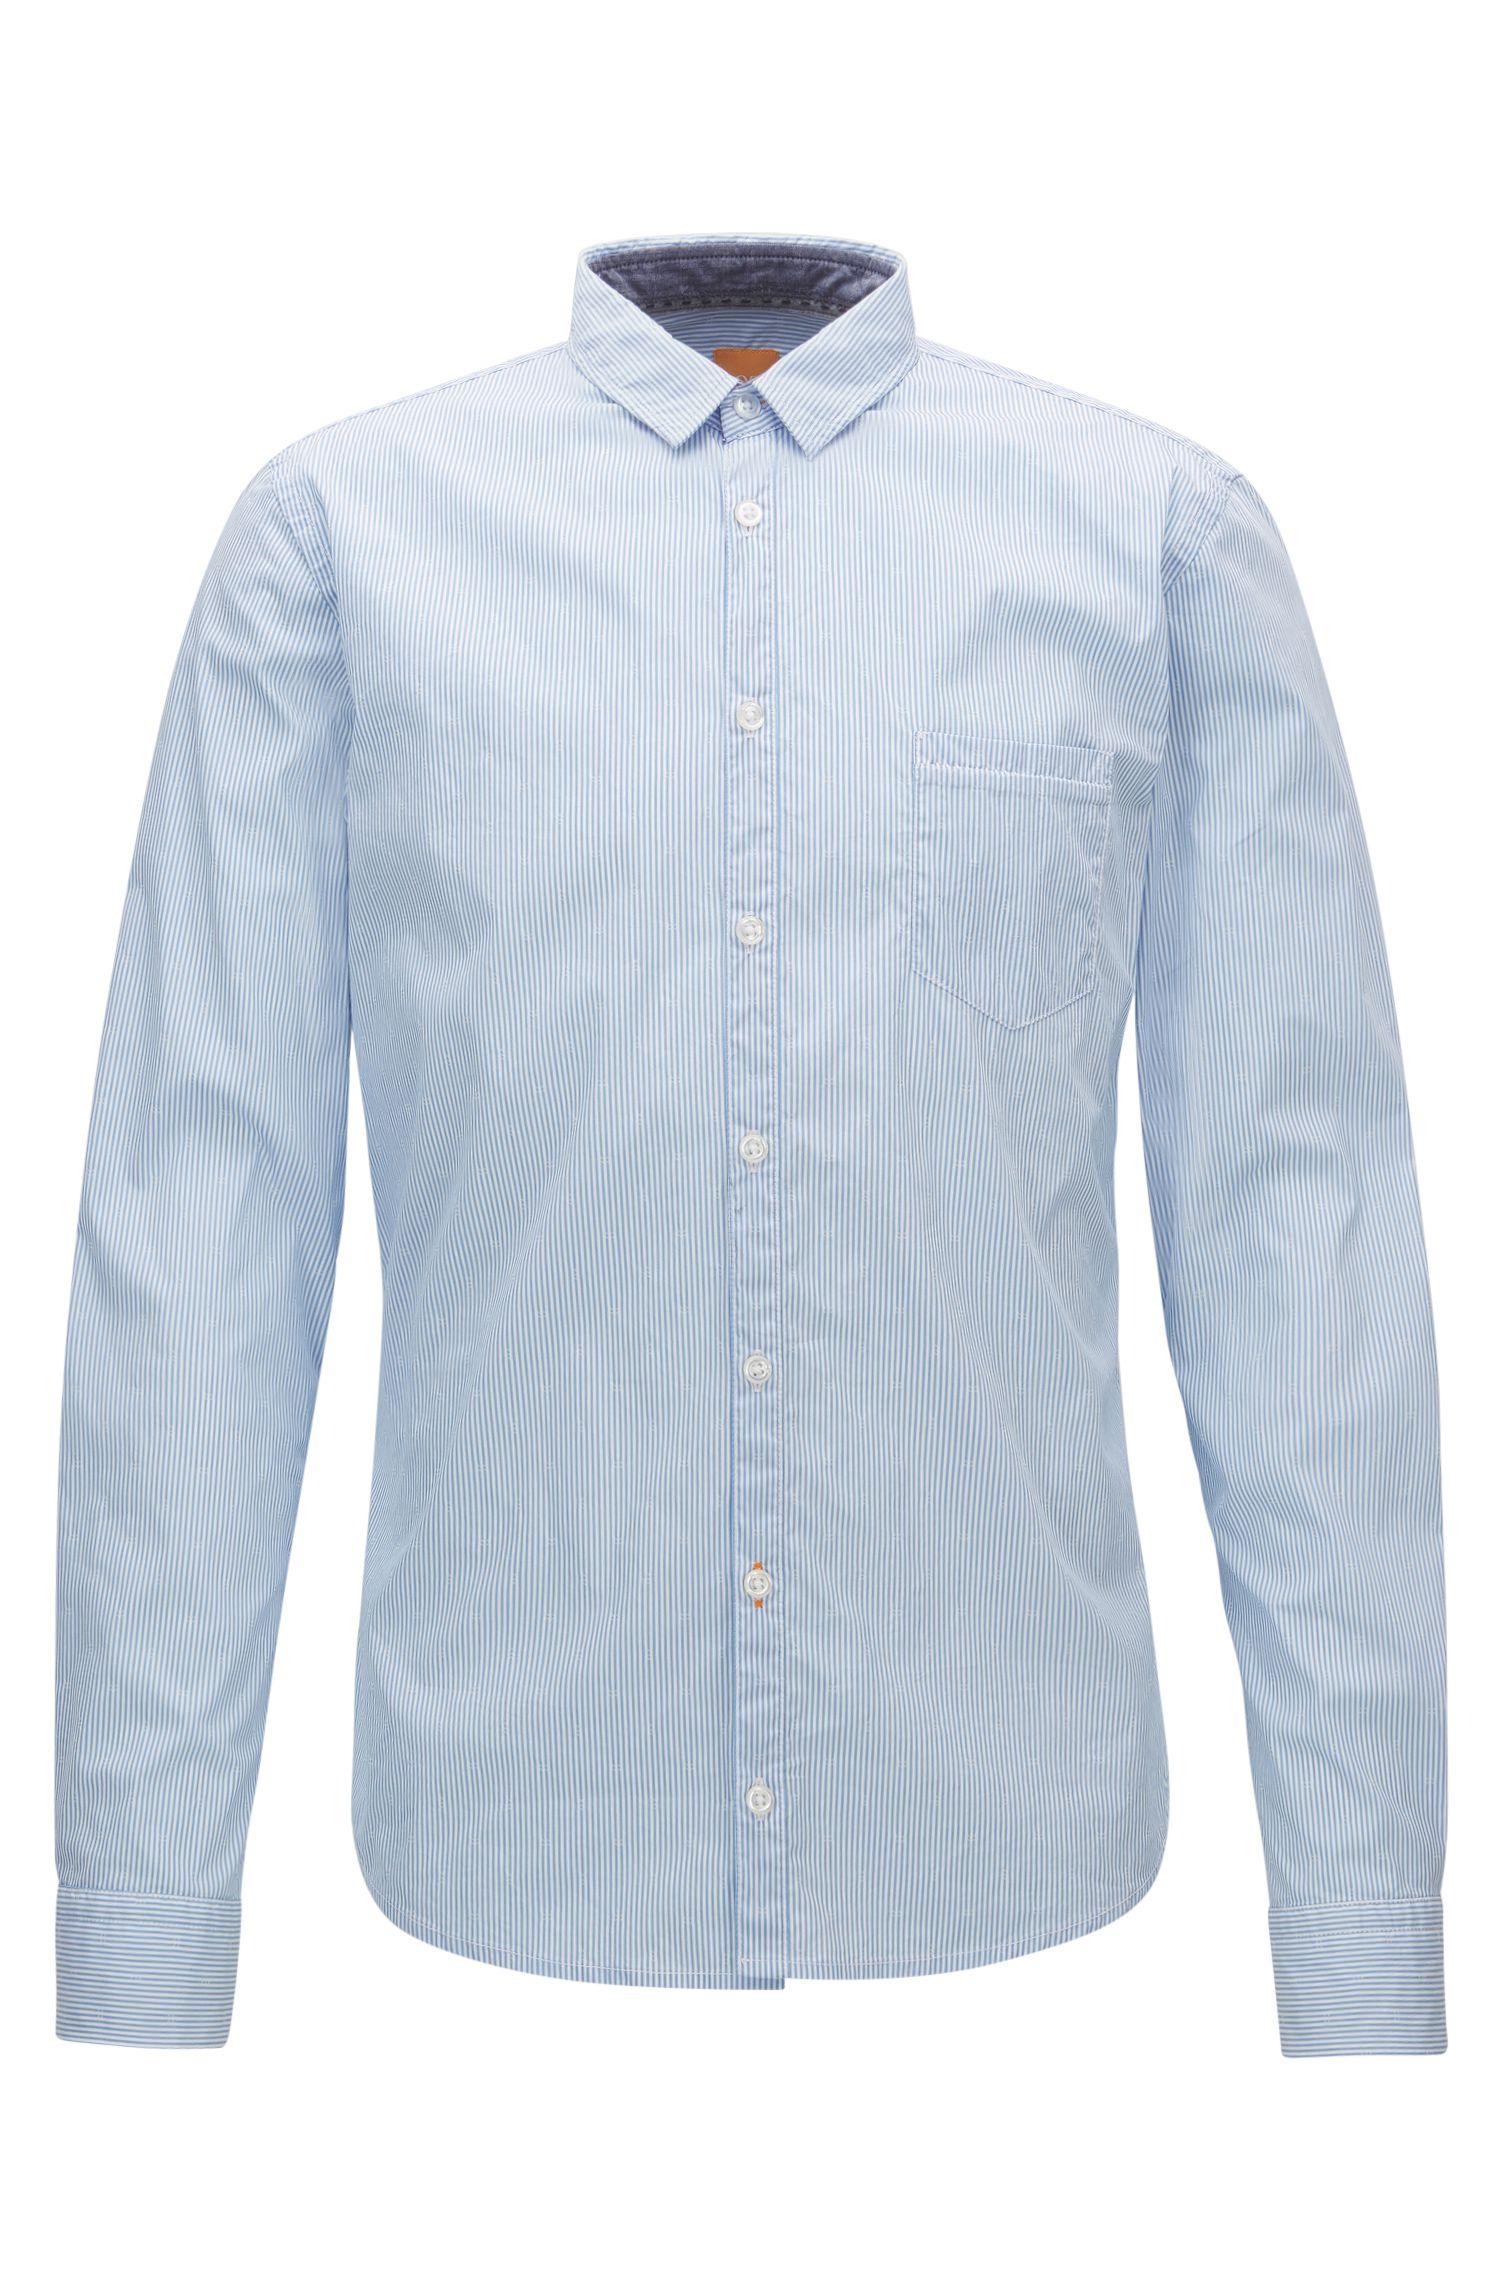 Striped Stretch Cotton Button Down Shirt, Extra Slim Fit | Eglam